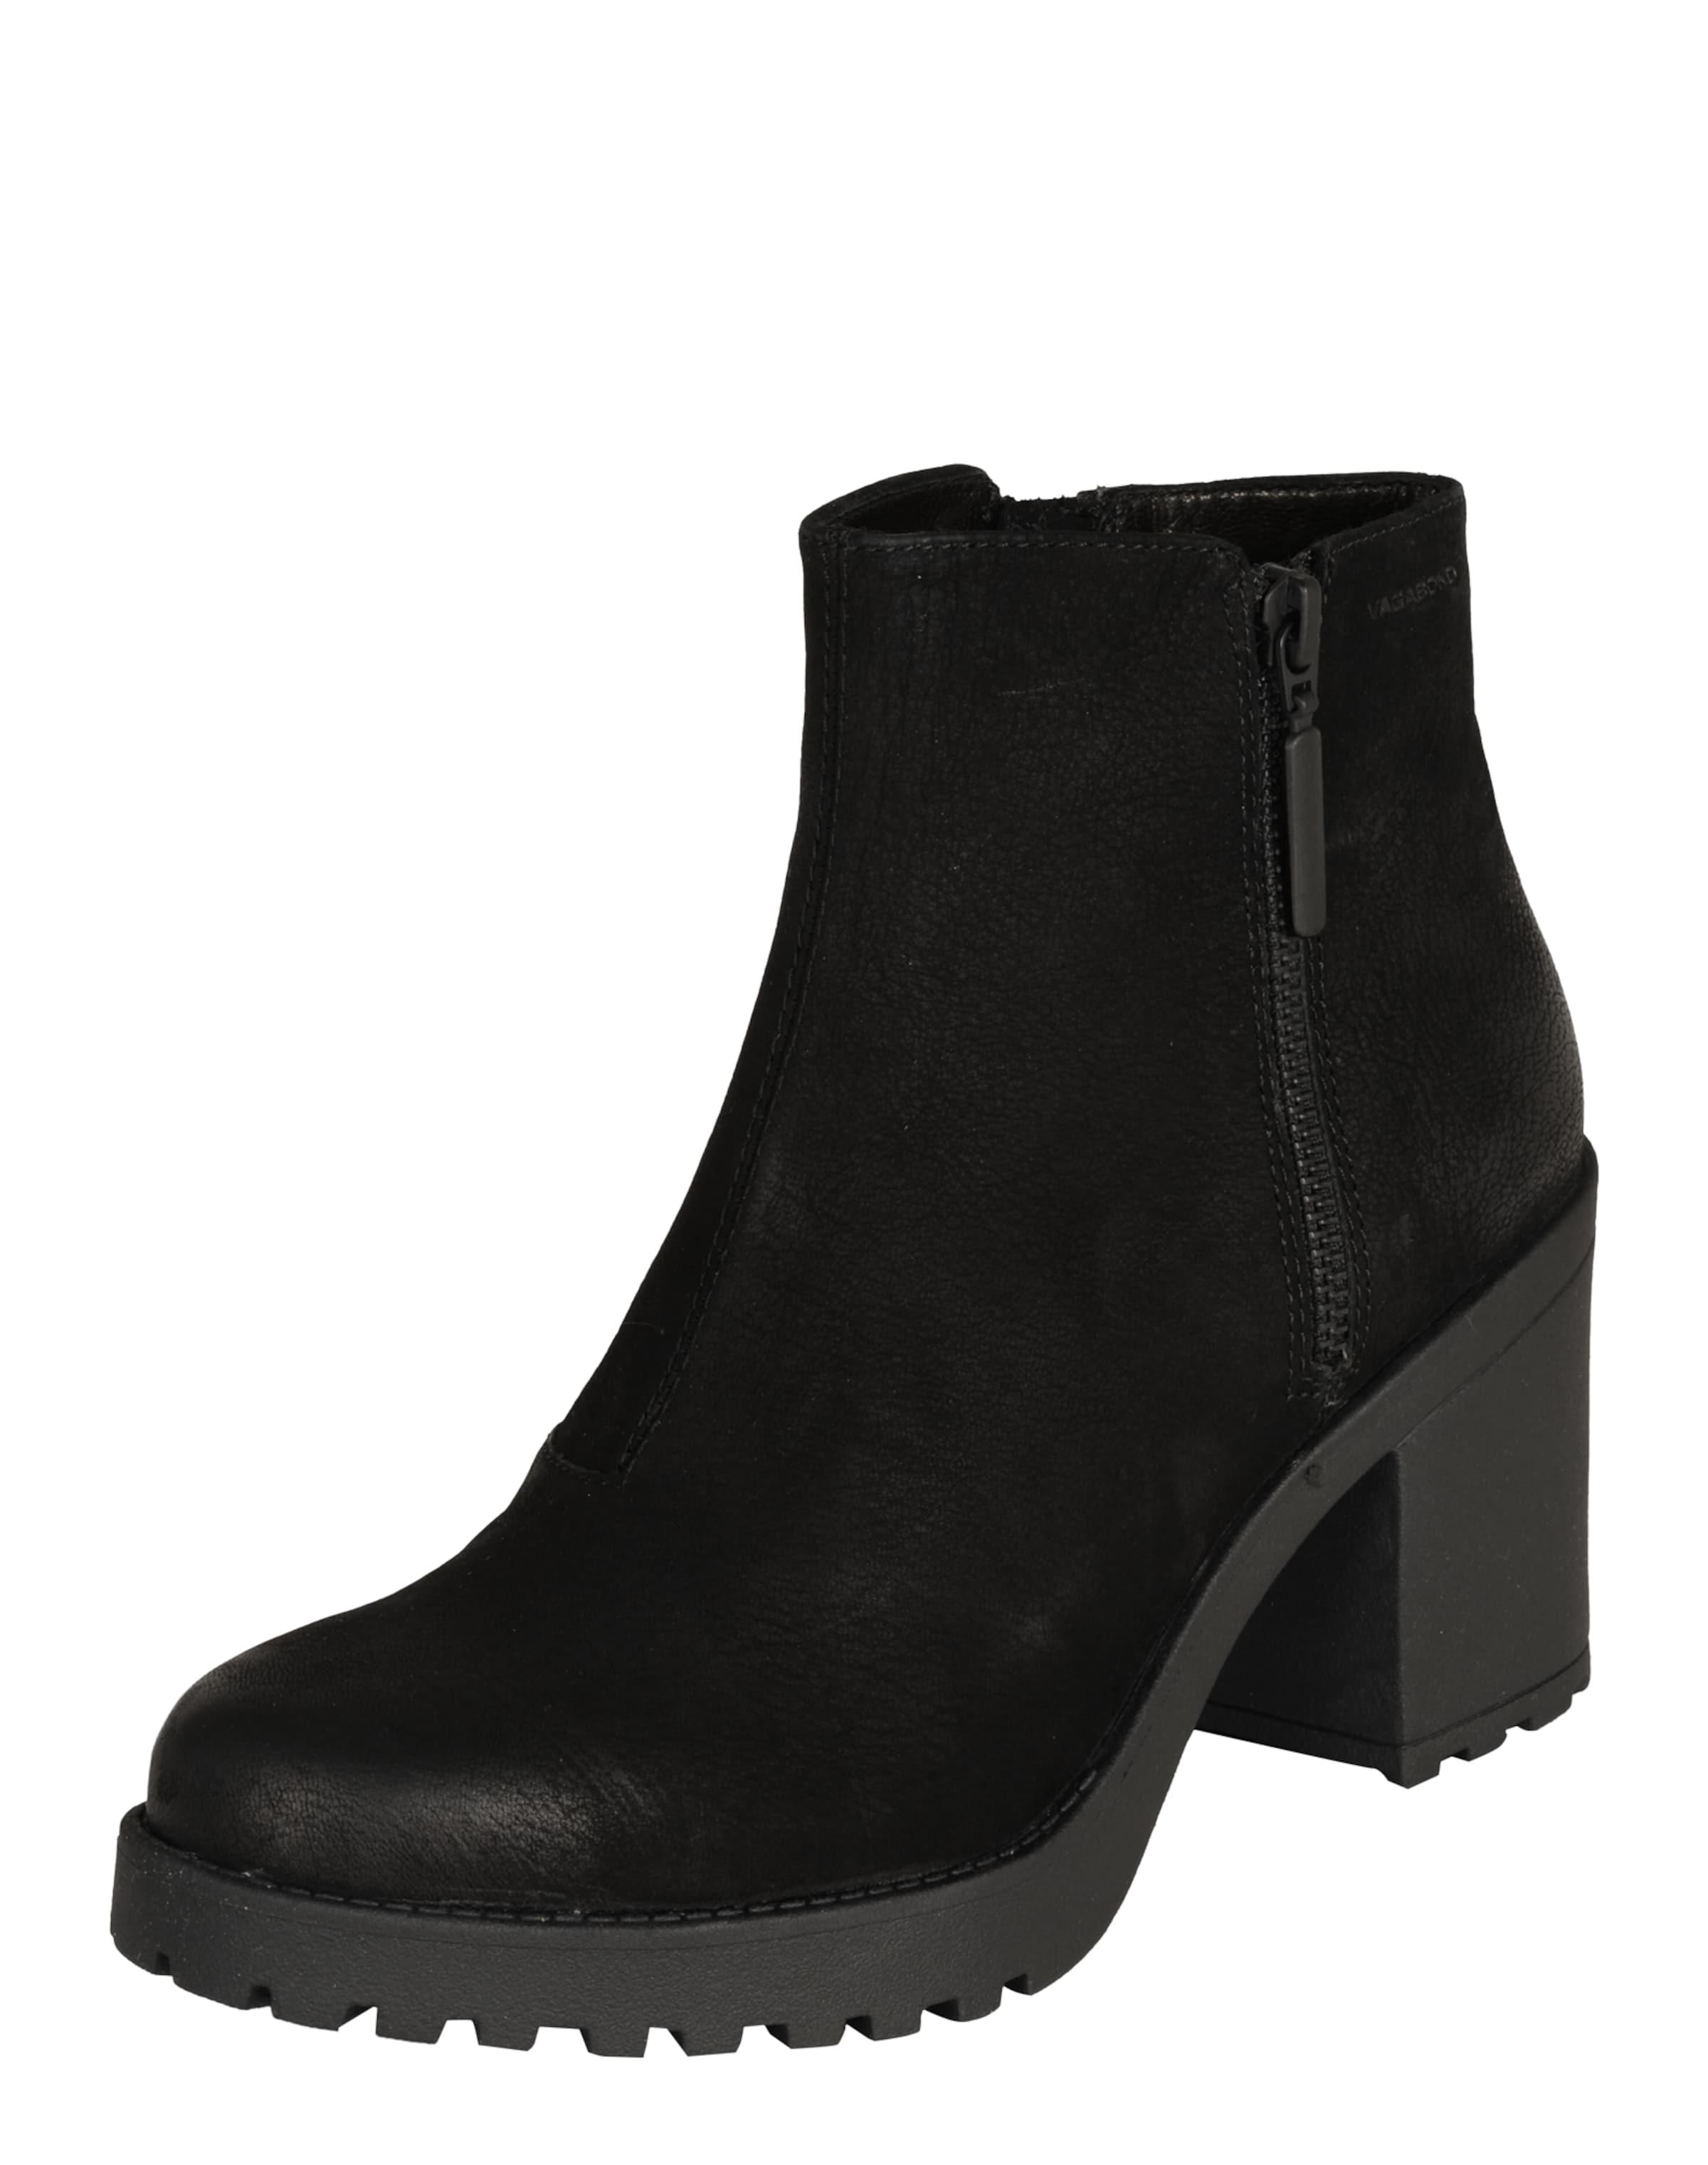 Haltbare Mode billige Schuhe VAGABOND SHOEMAKERS | Stiefeletten 'Grace' Schuhe Gut getragene Schuhe